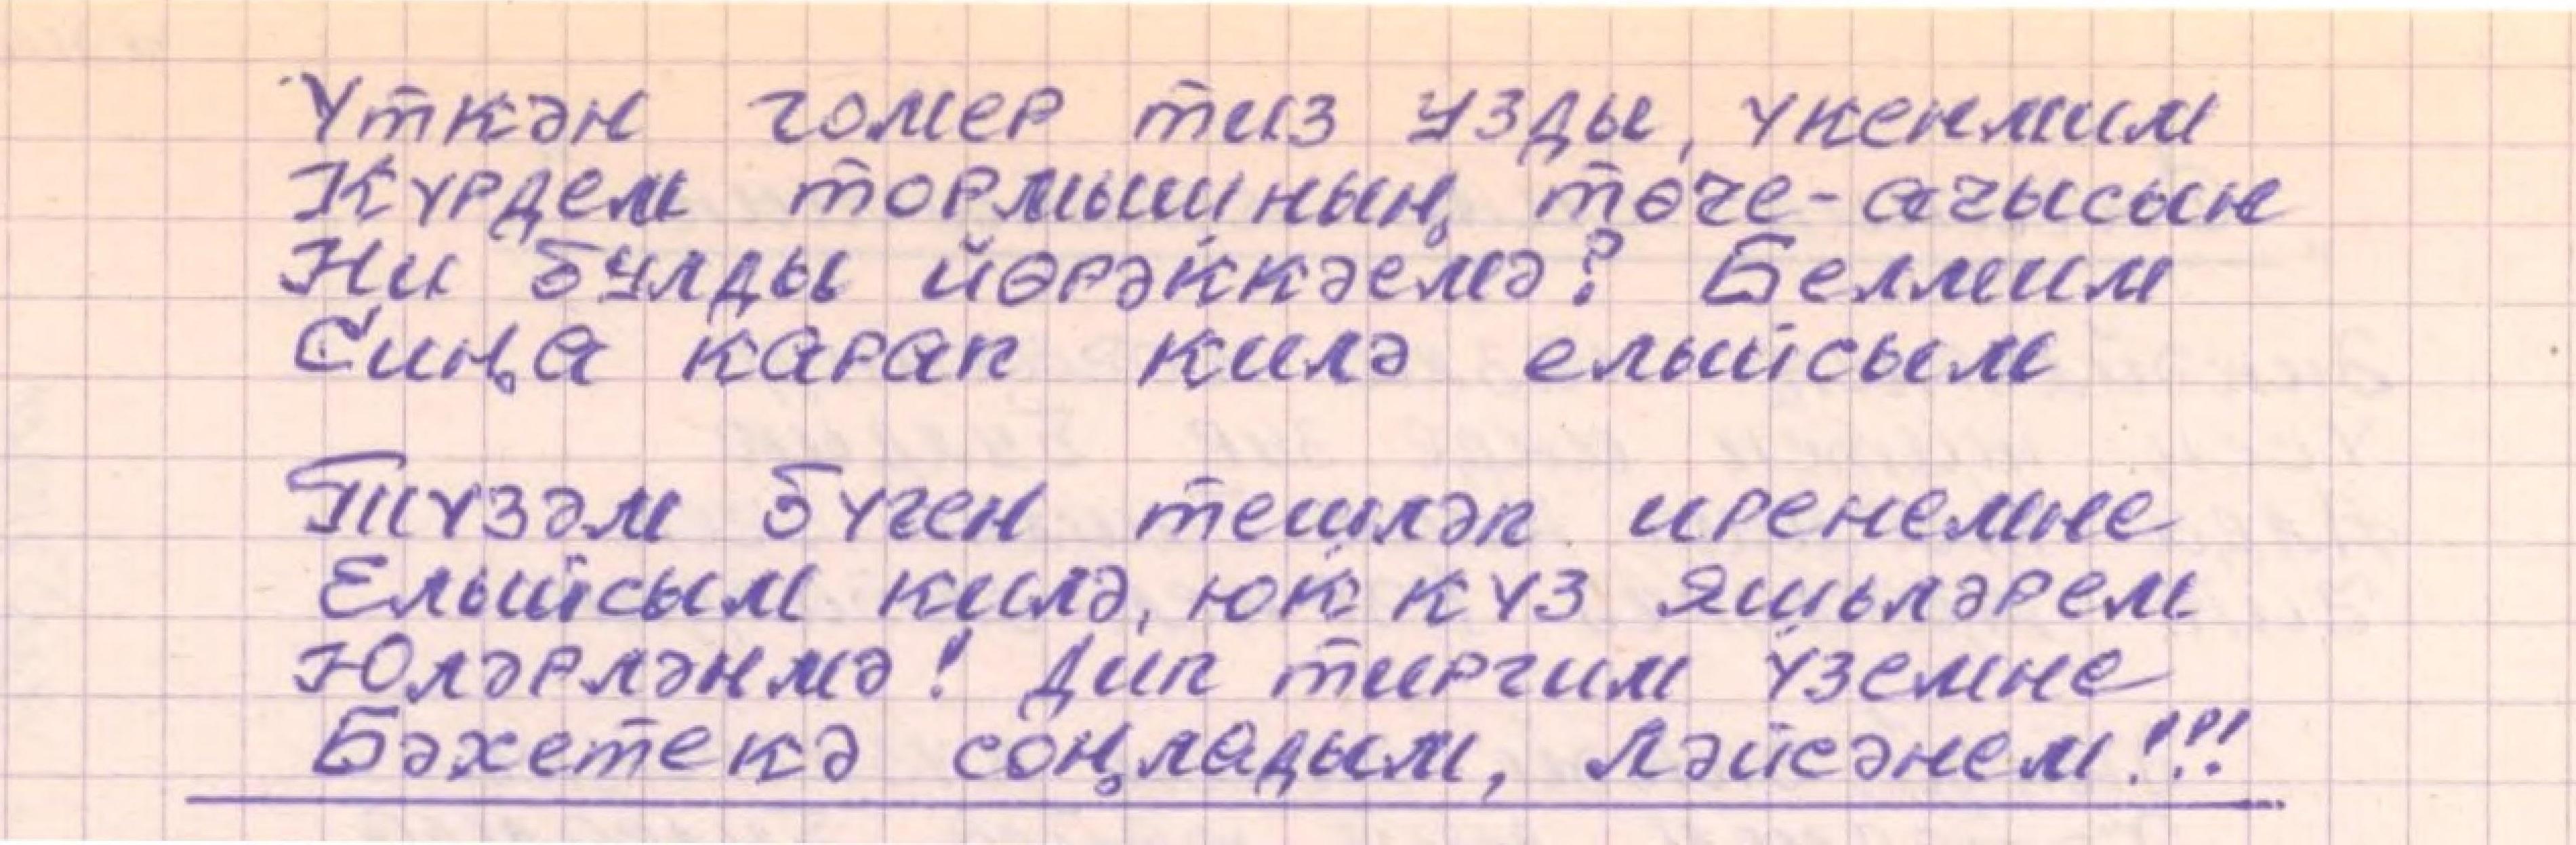 0006 Биктимеров Габделкай   шигырьләр